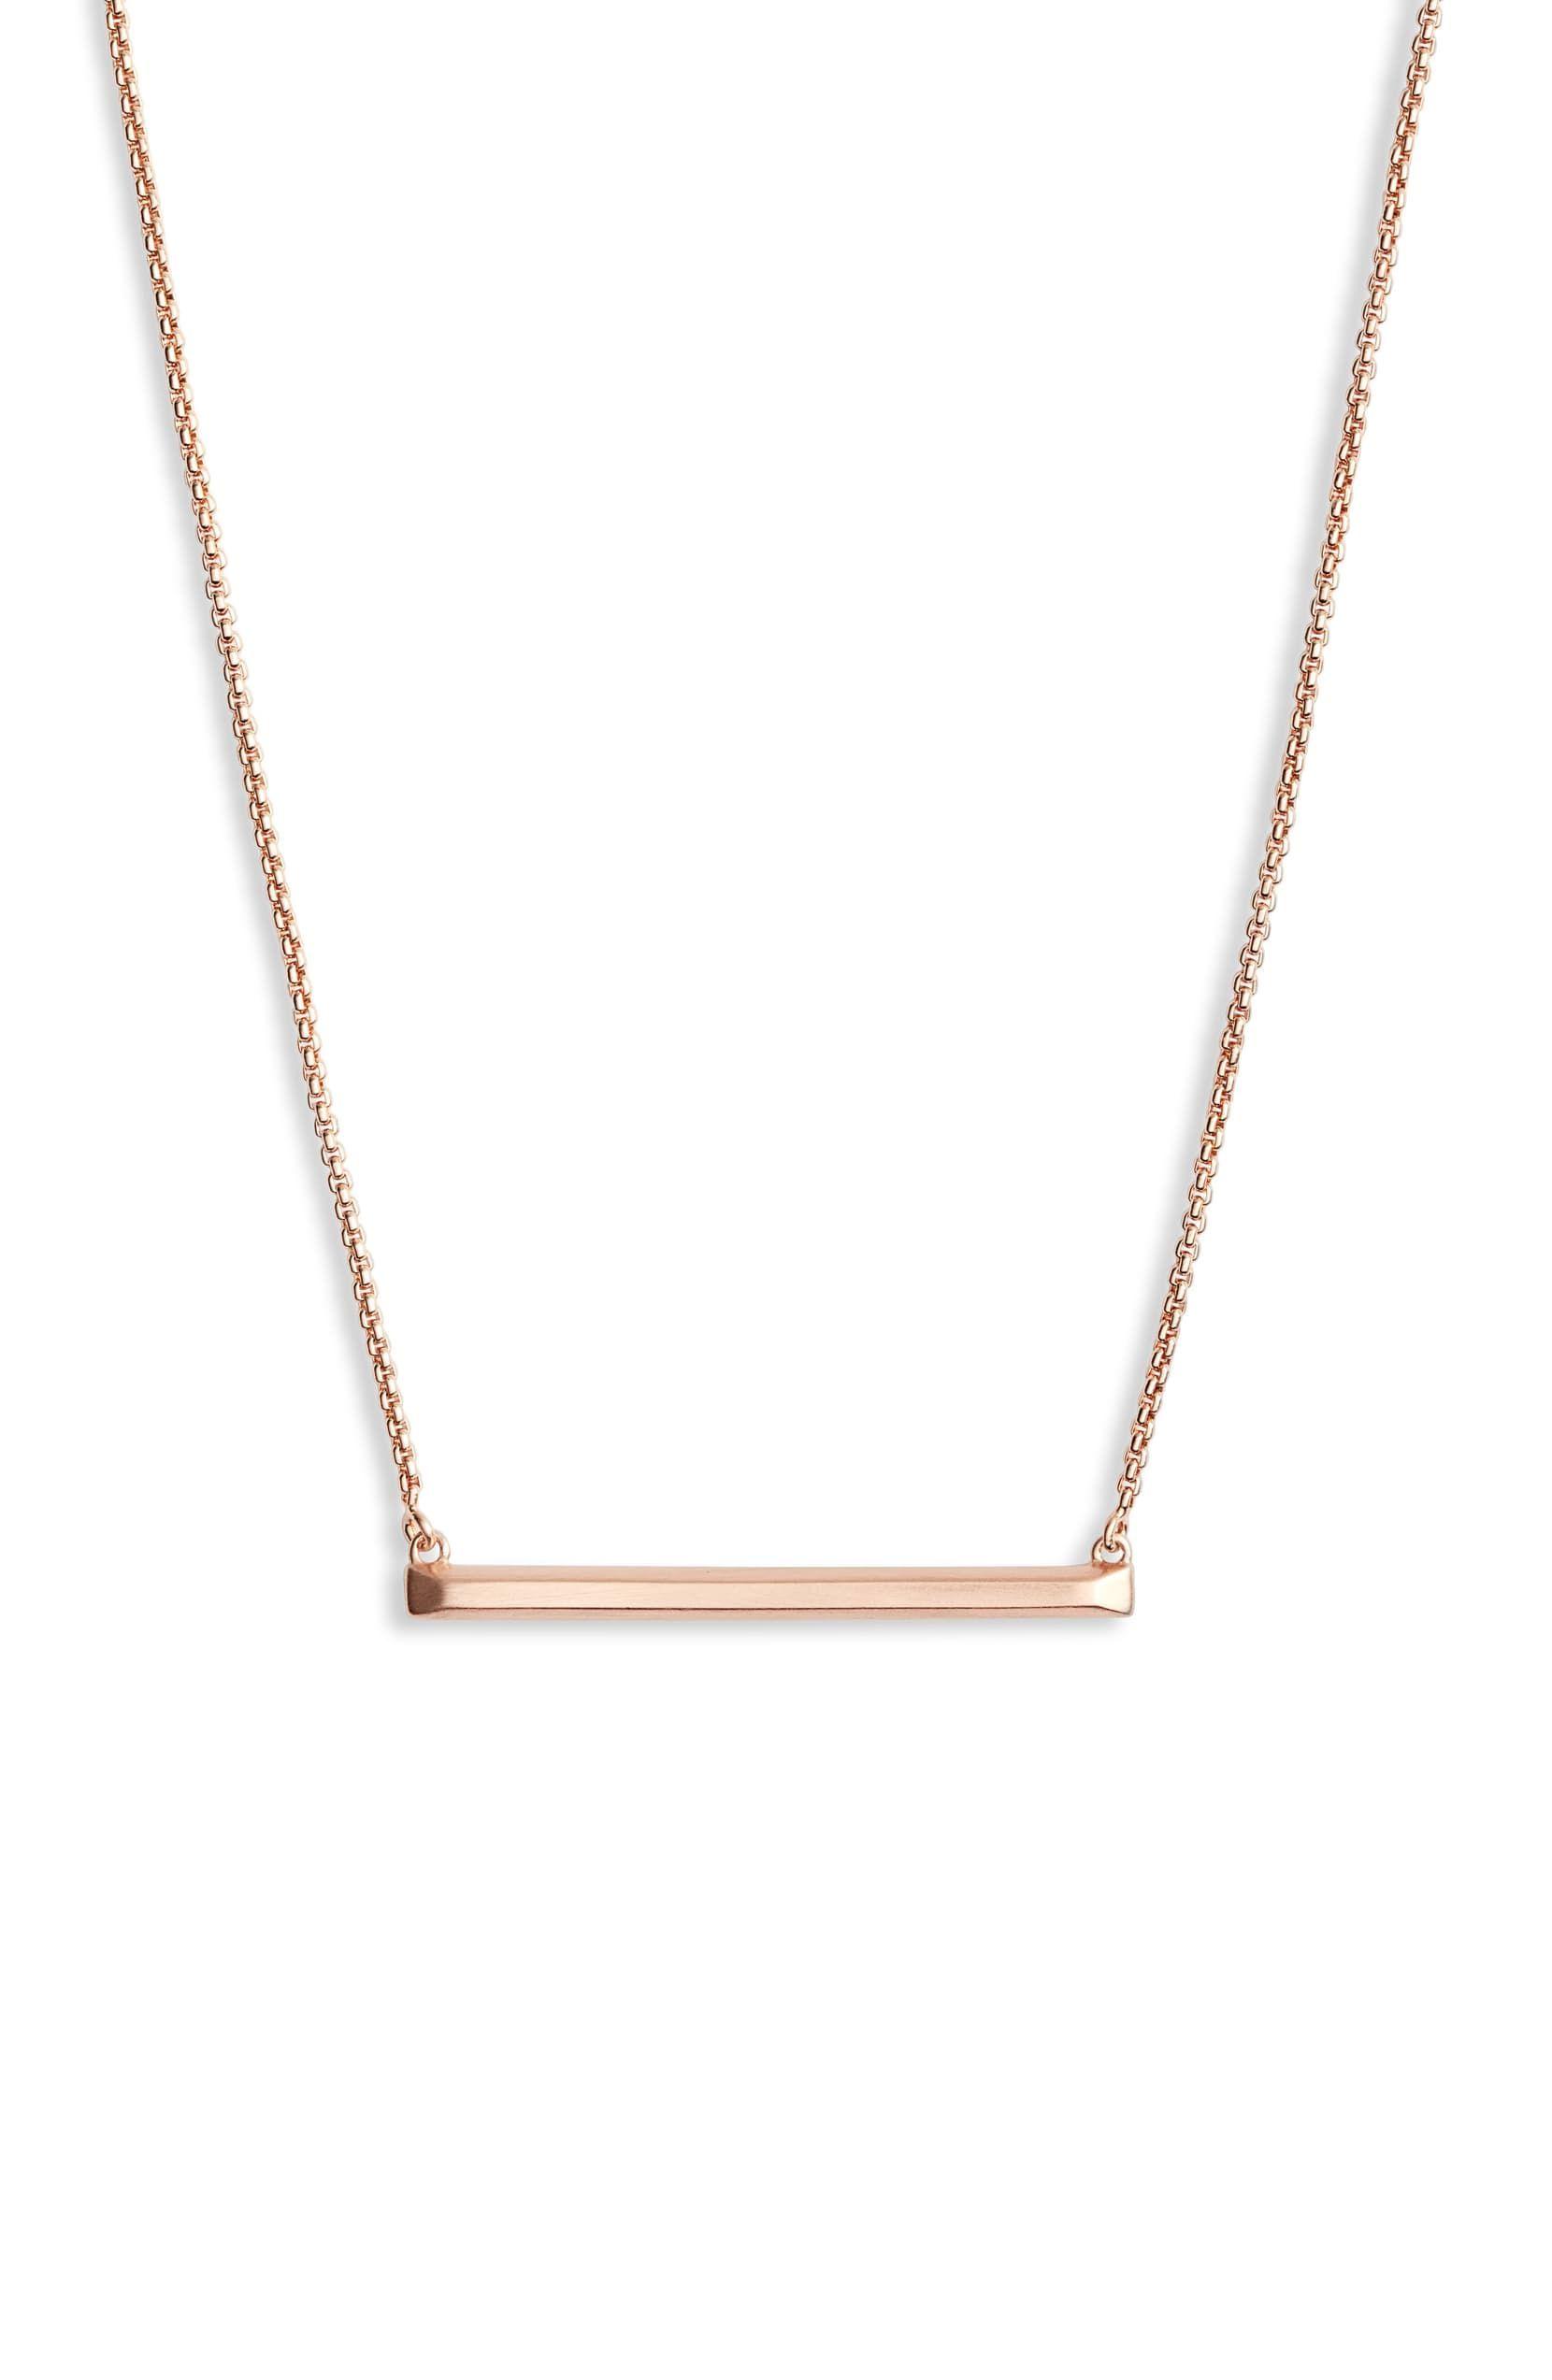 28 Best Jewelry Brands 2020 Cute Jewelry Brands To Shop Now